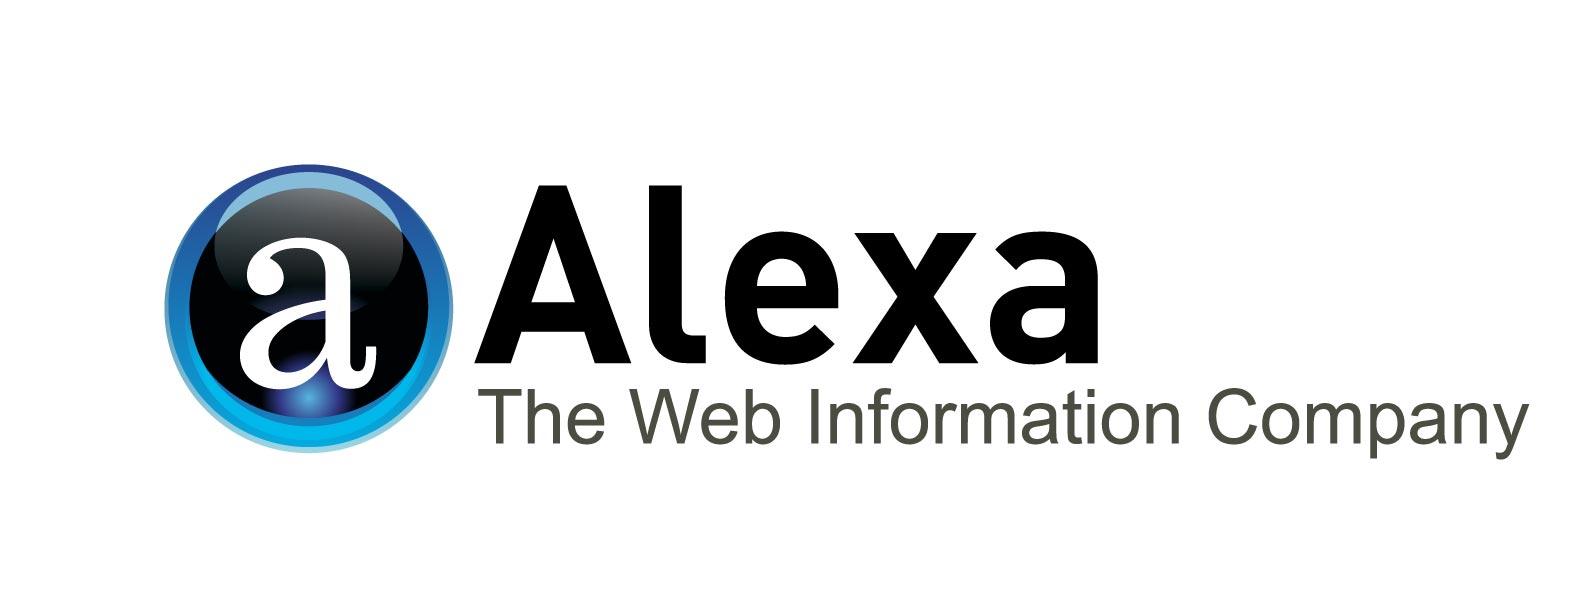 alexa logo for New Year's growth